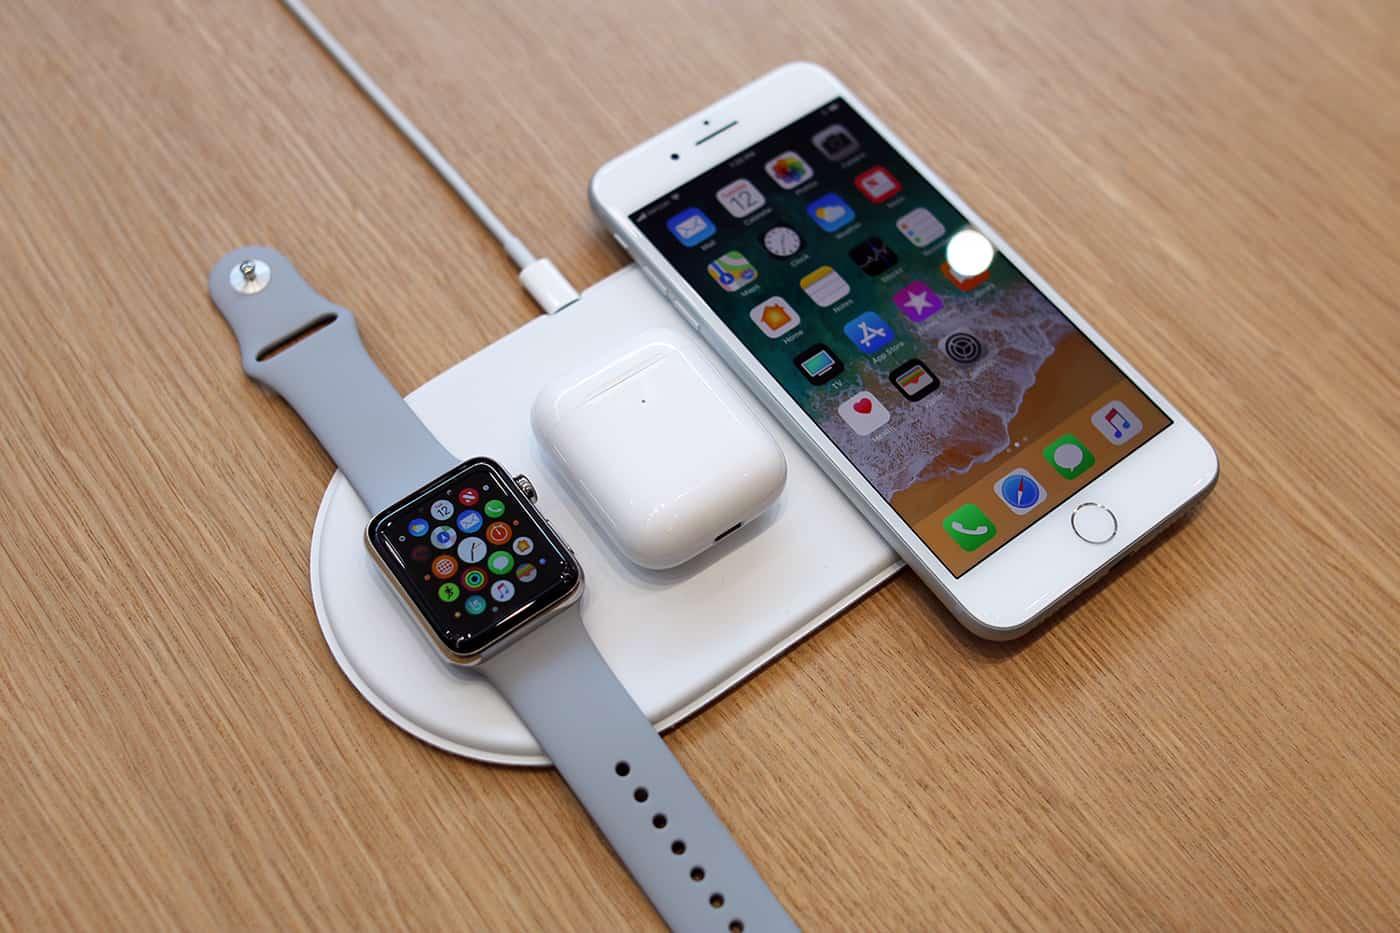 AppleAirPower